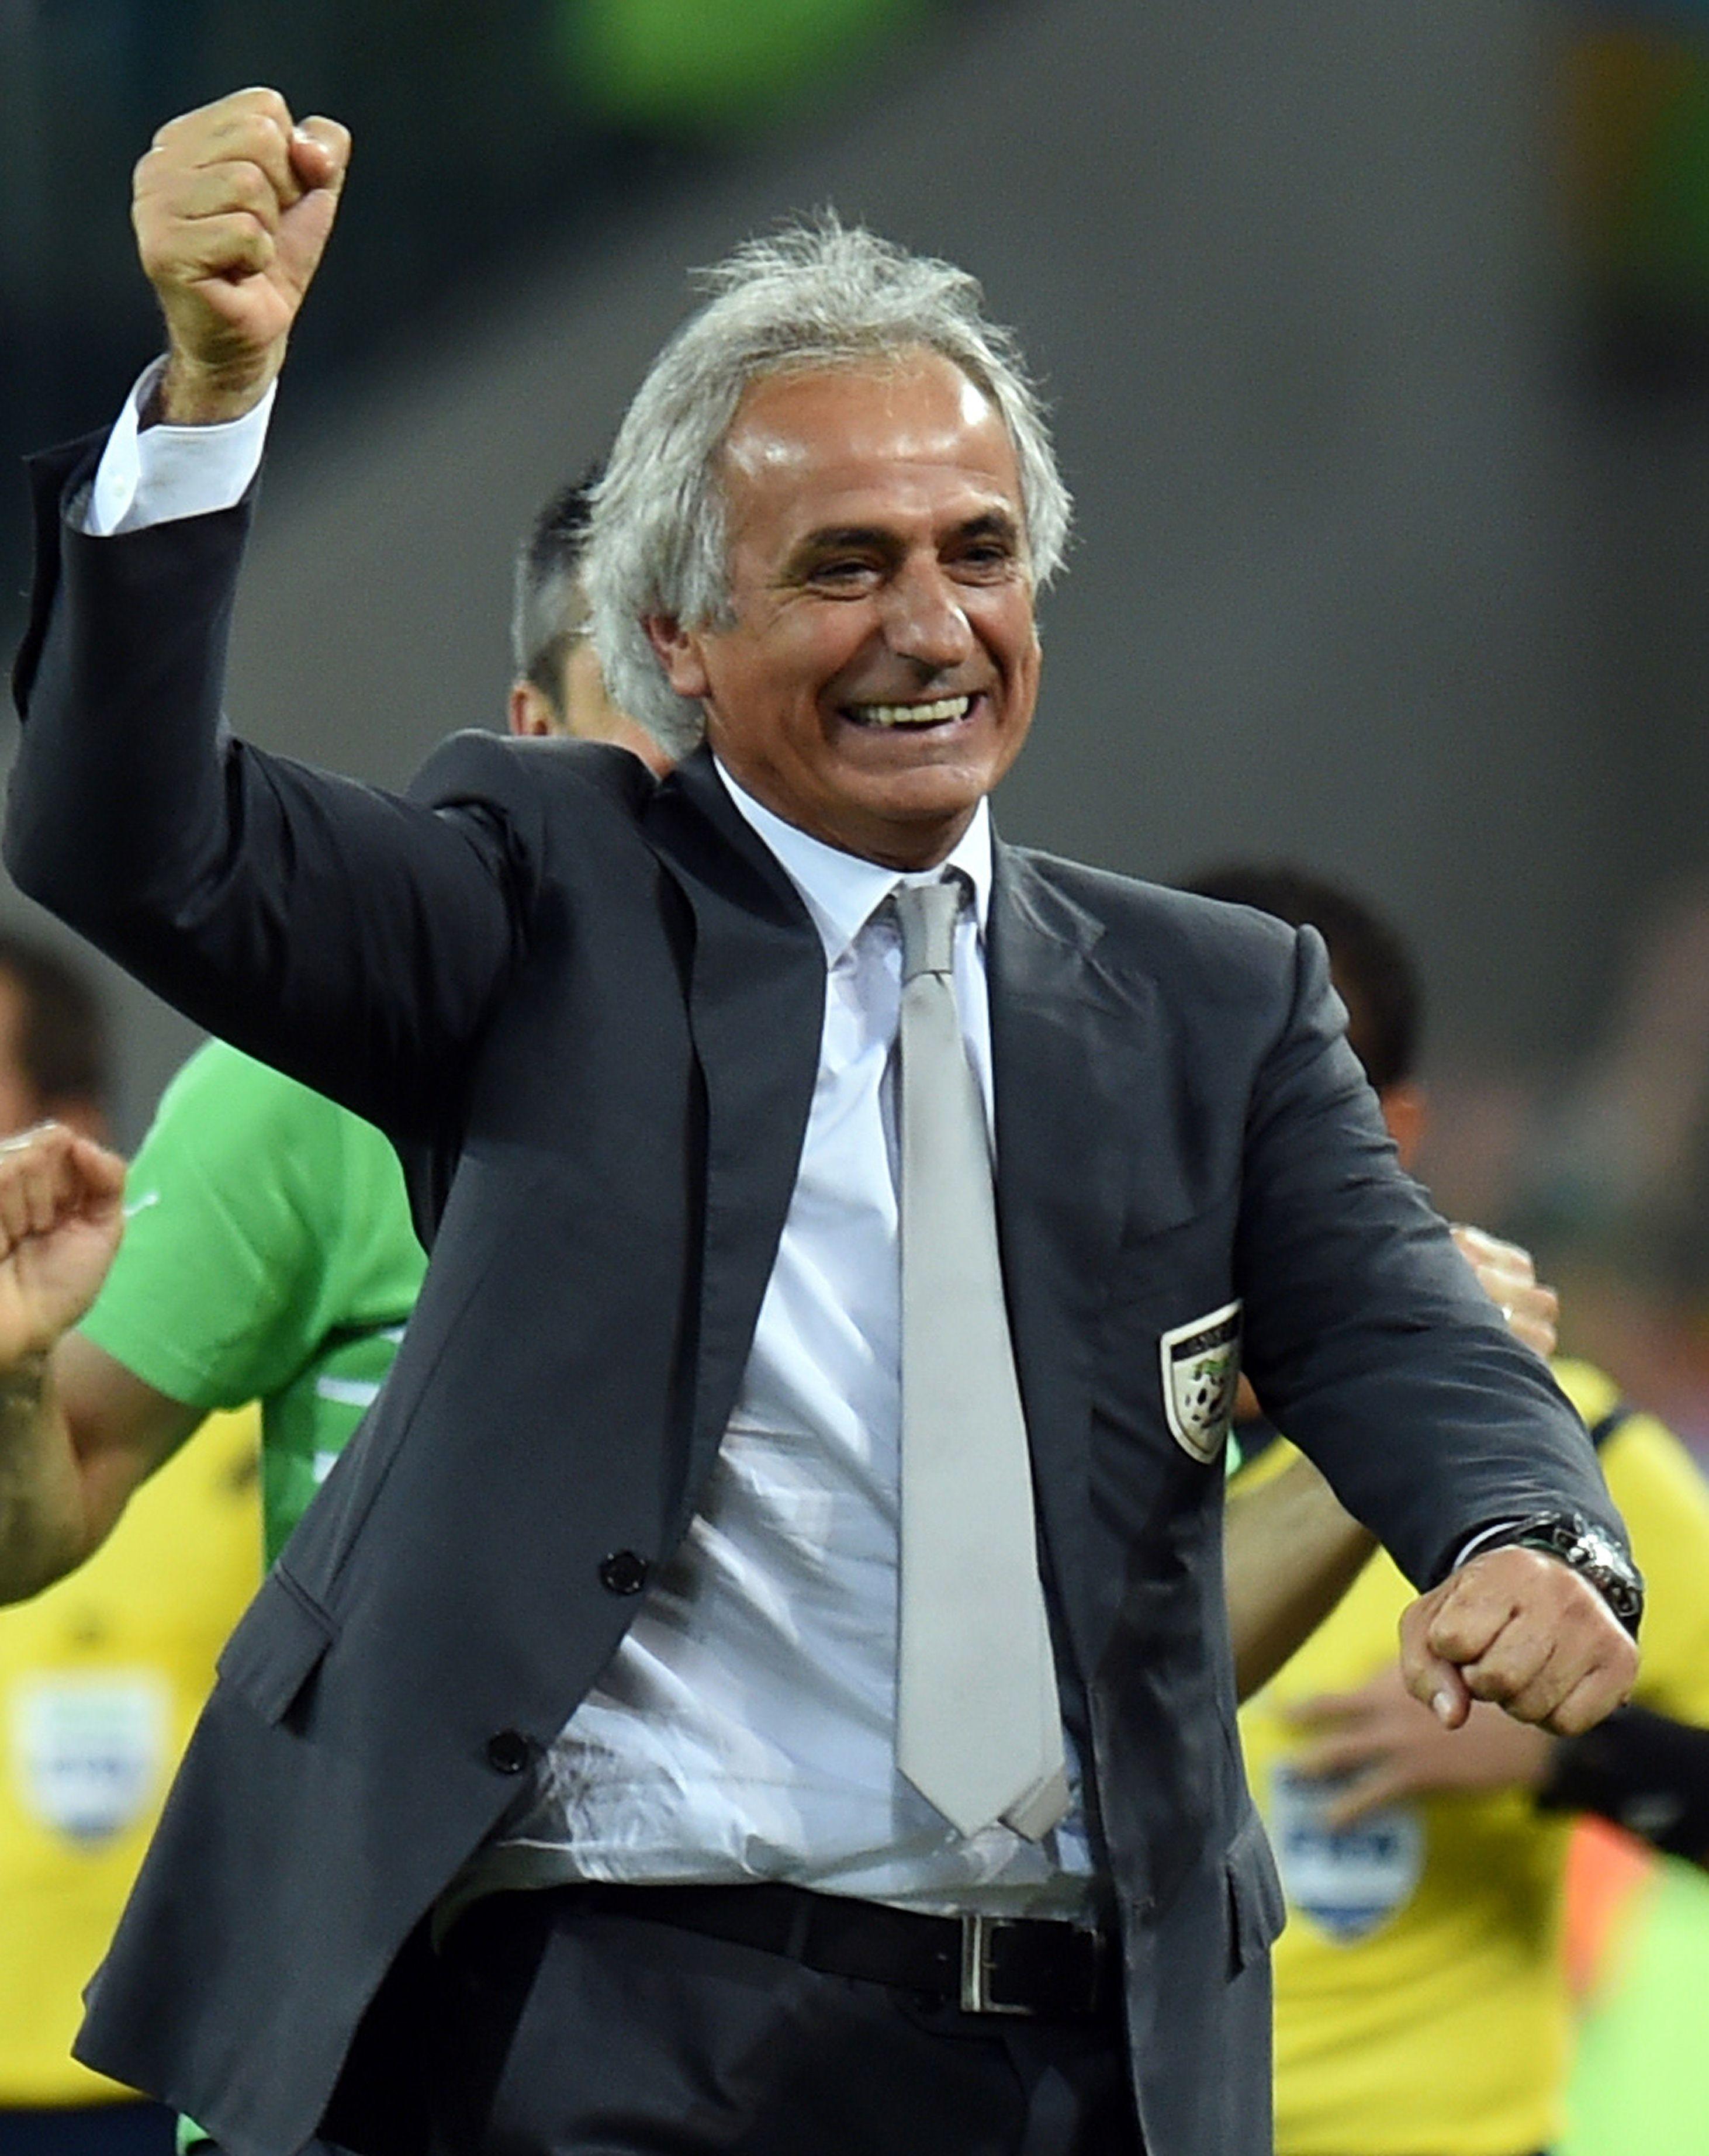 Mondial 2018, Sénégal, Vahid Halilhodžić